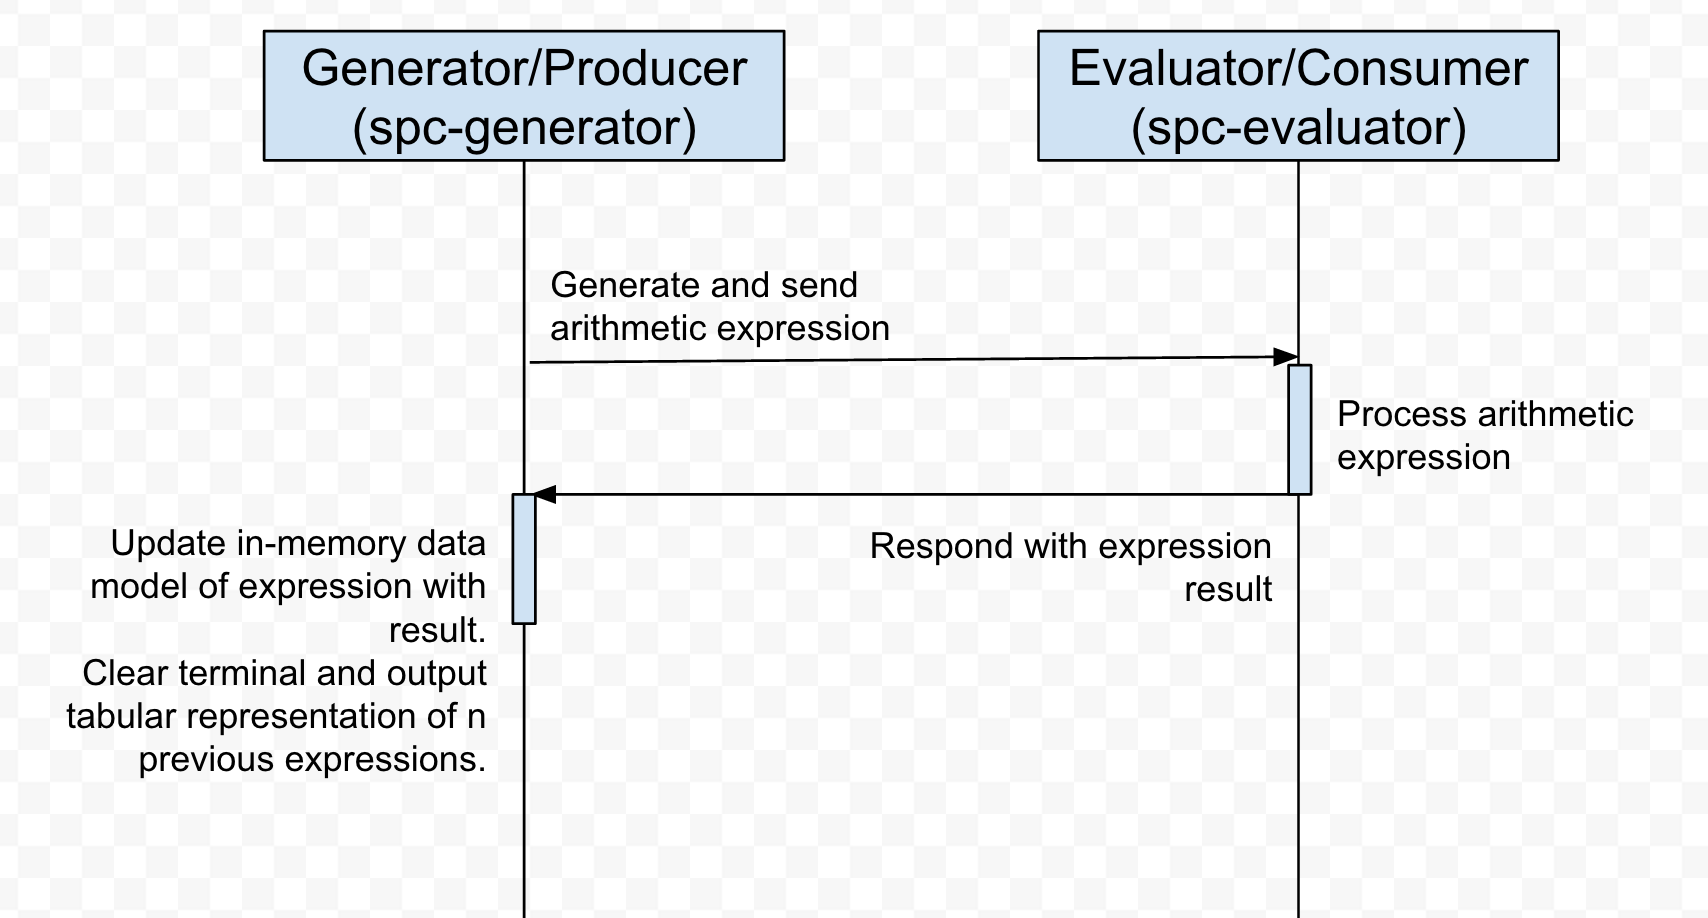 UML_Sequence